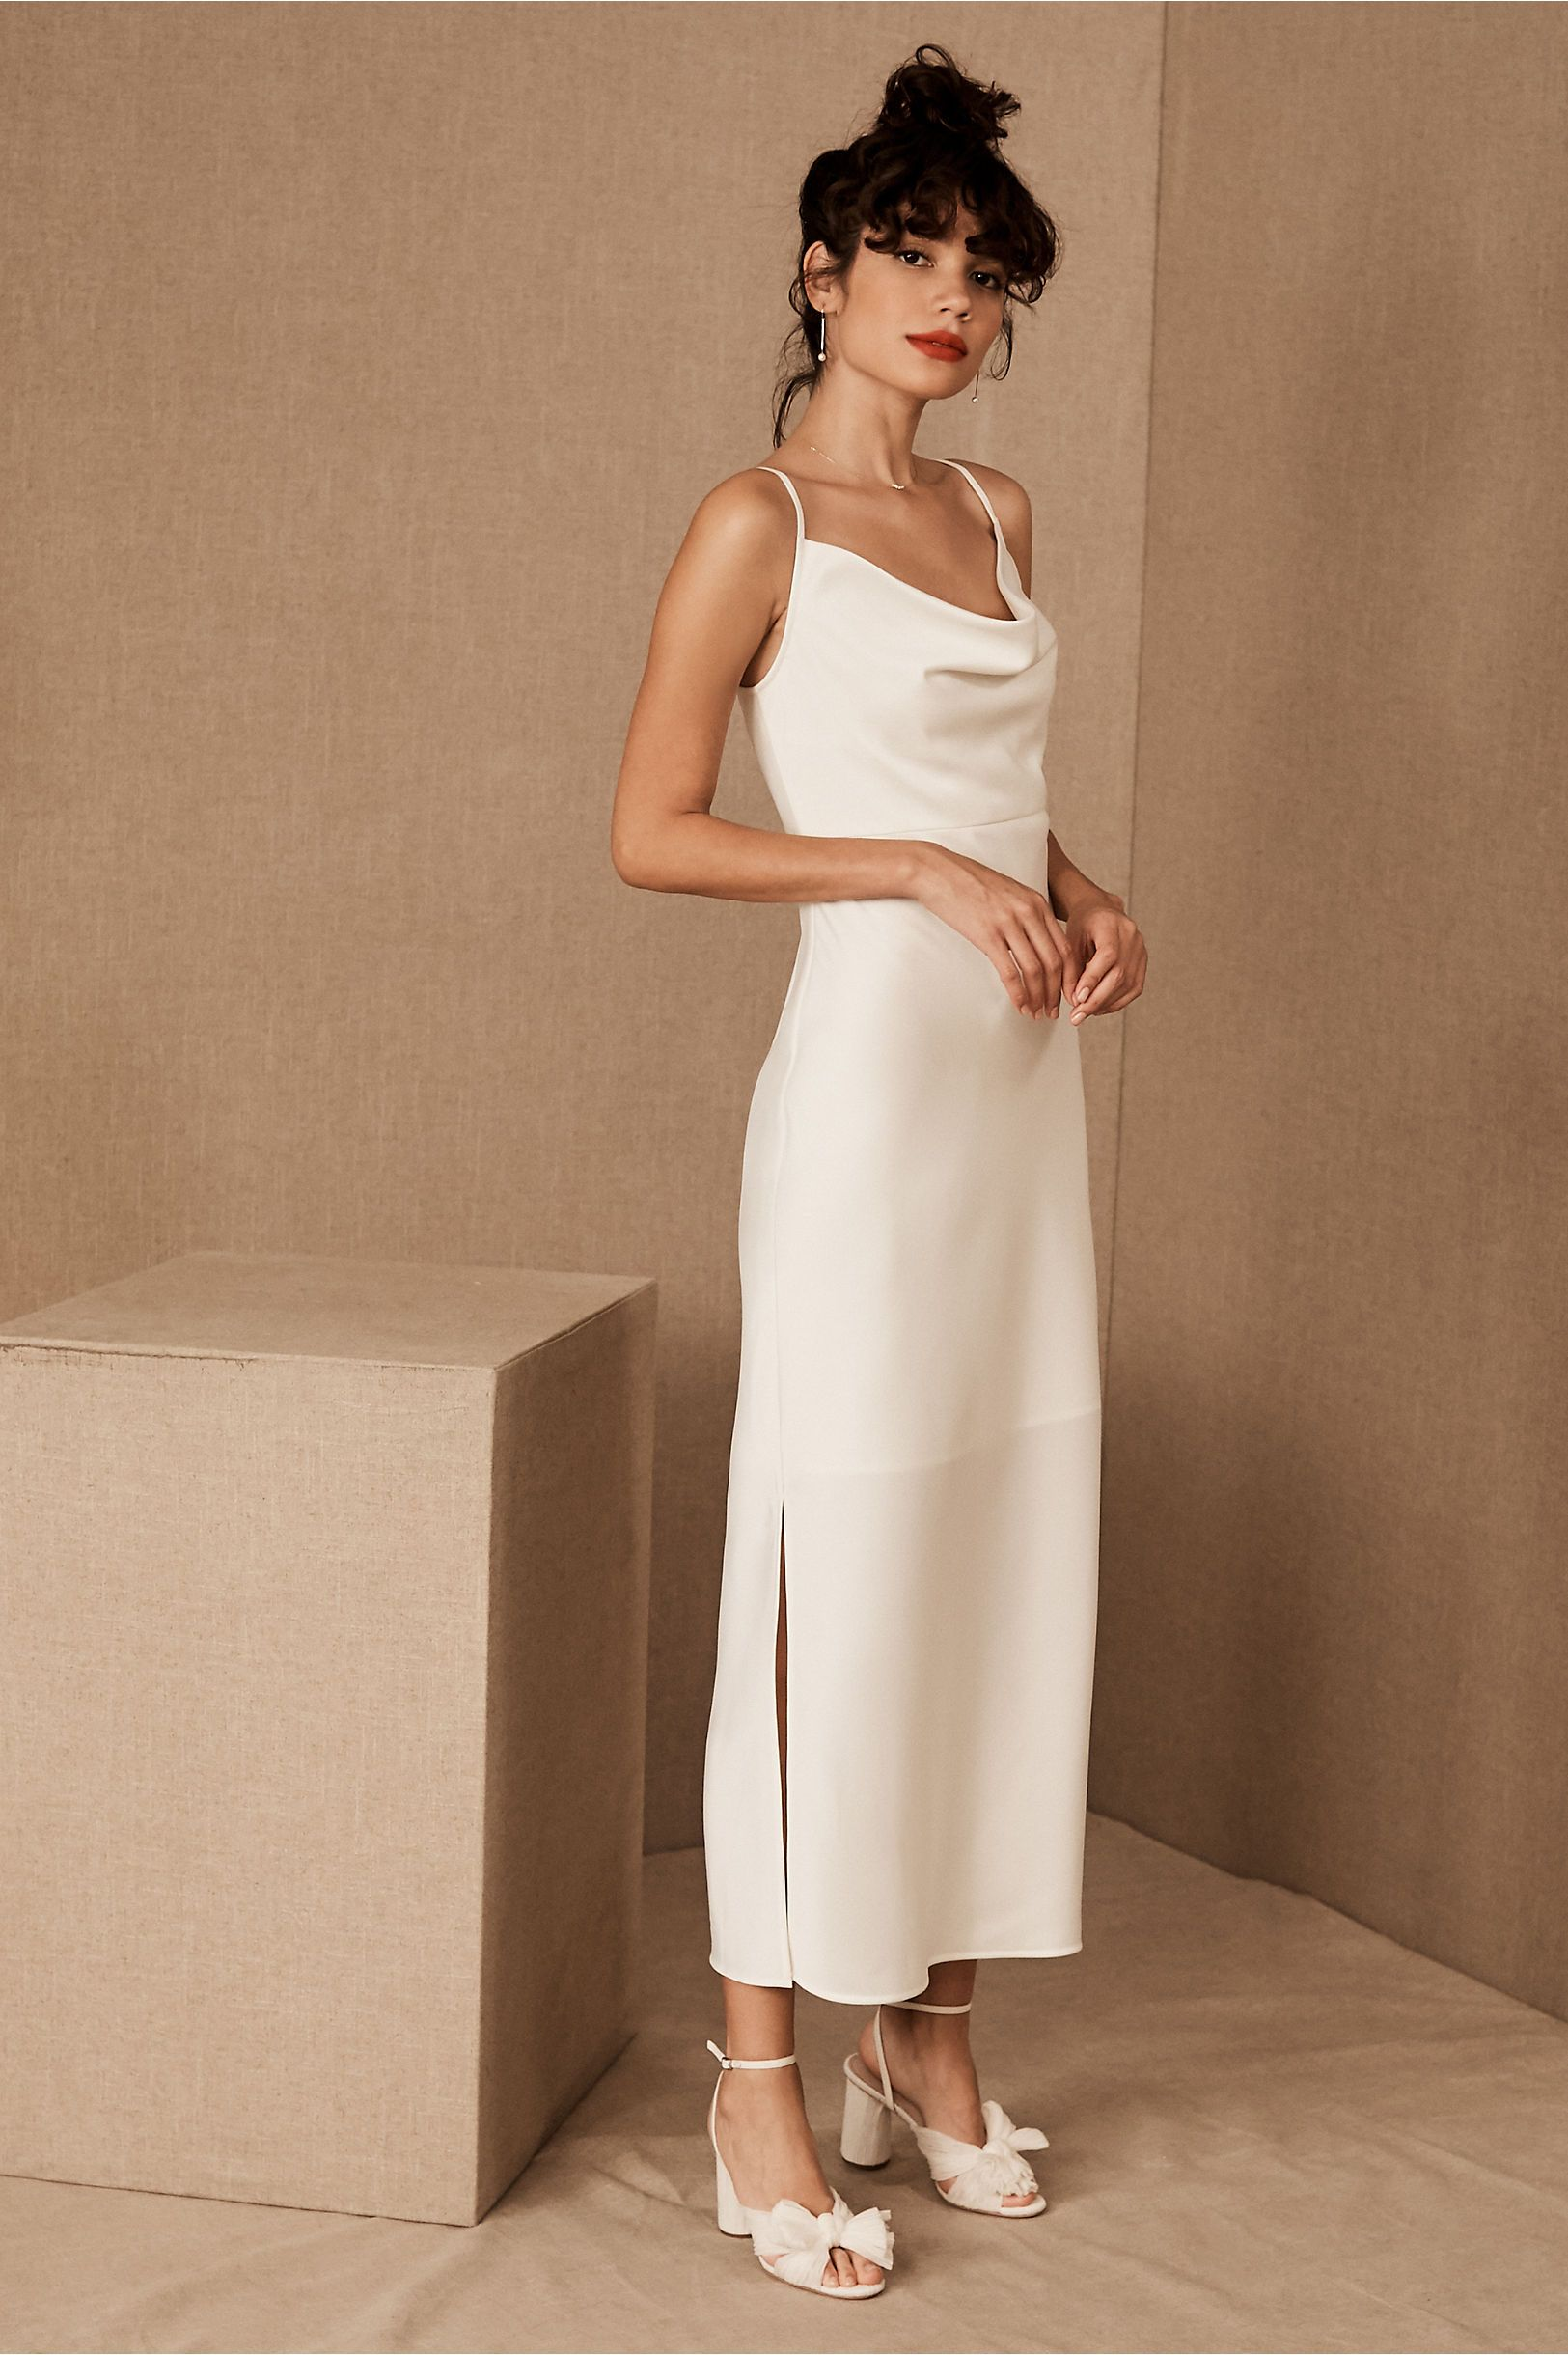 Kari Dress From Bhldn Courthouse Wedding Dress Little White Dresses Engagement Party Dresses [ 2440 x 1625 Pixel ]